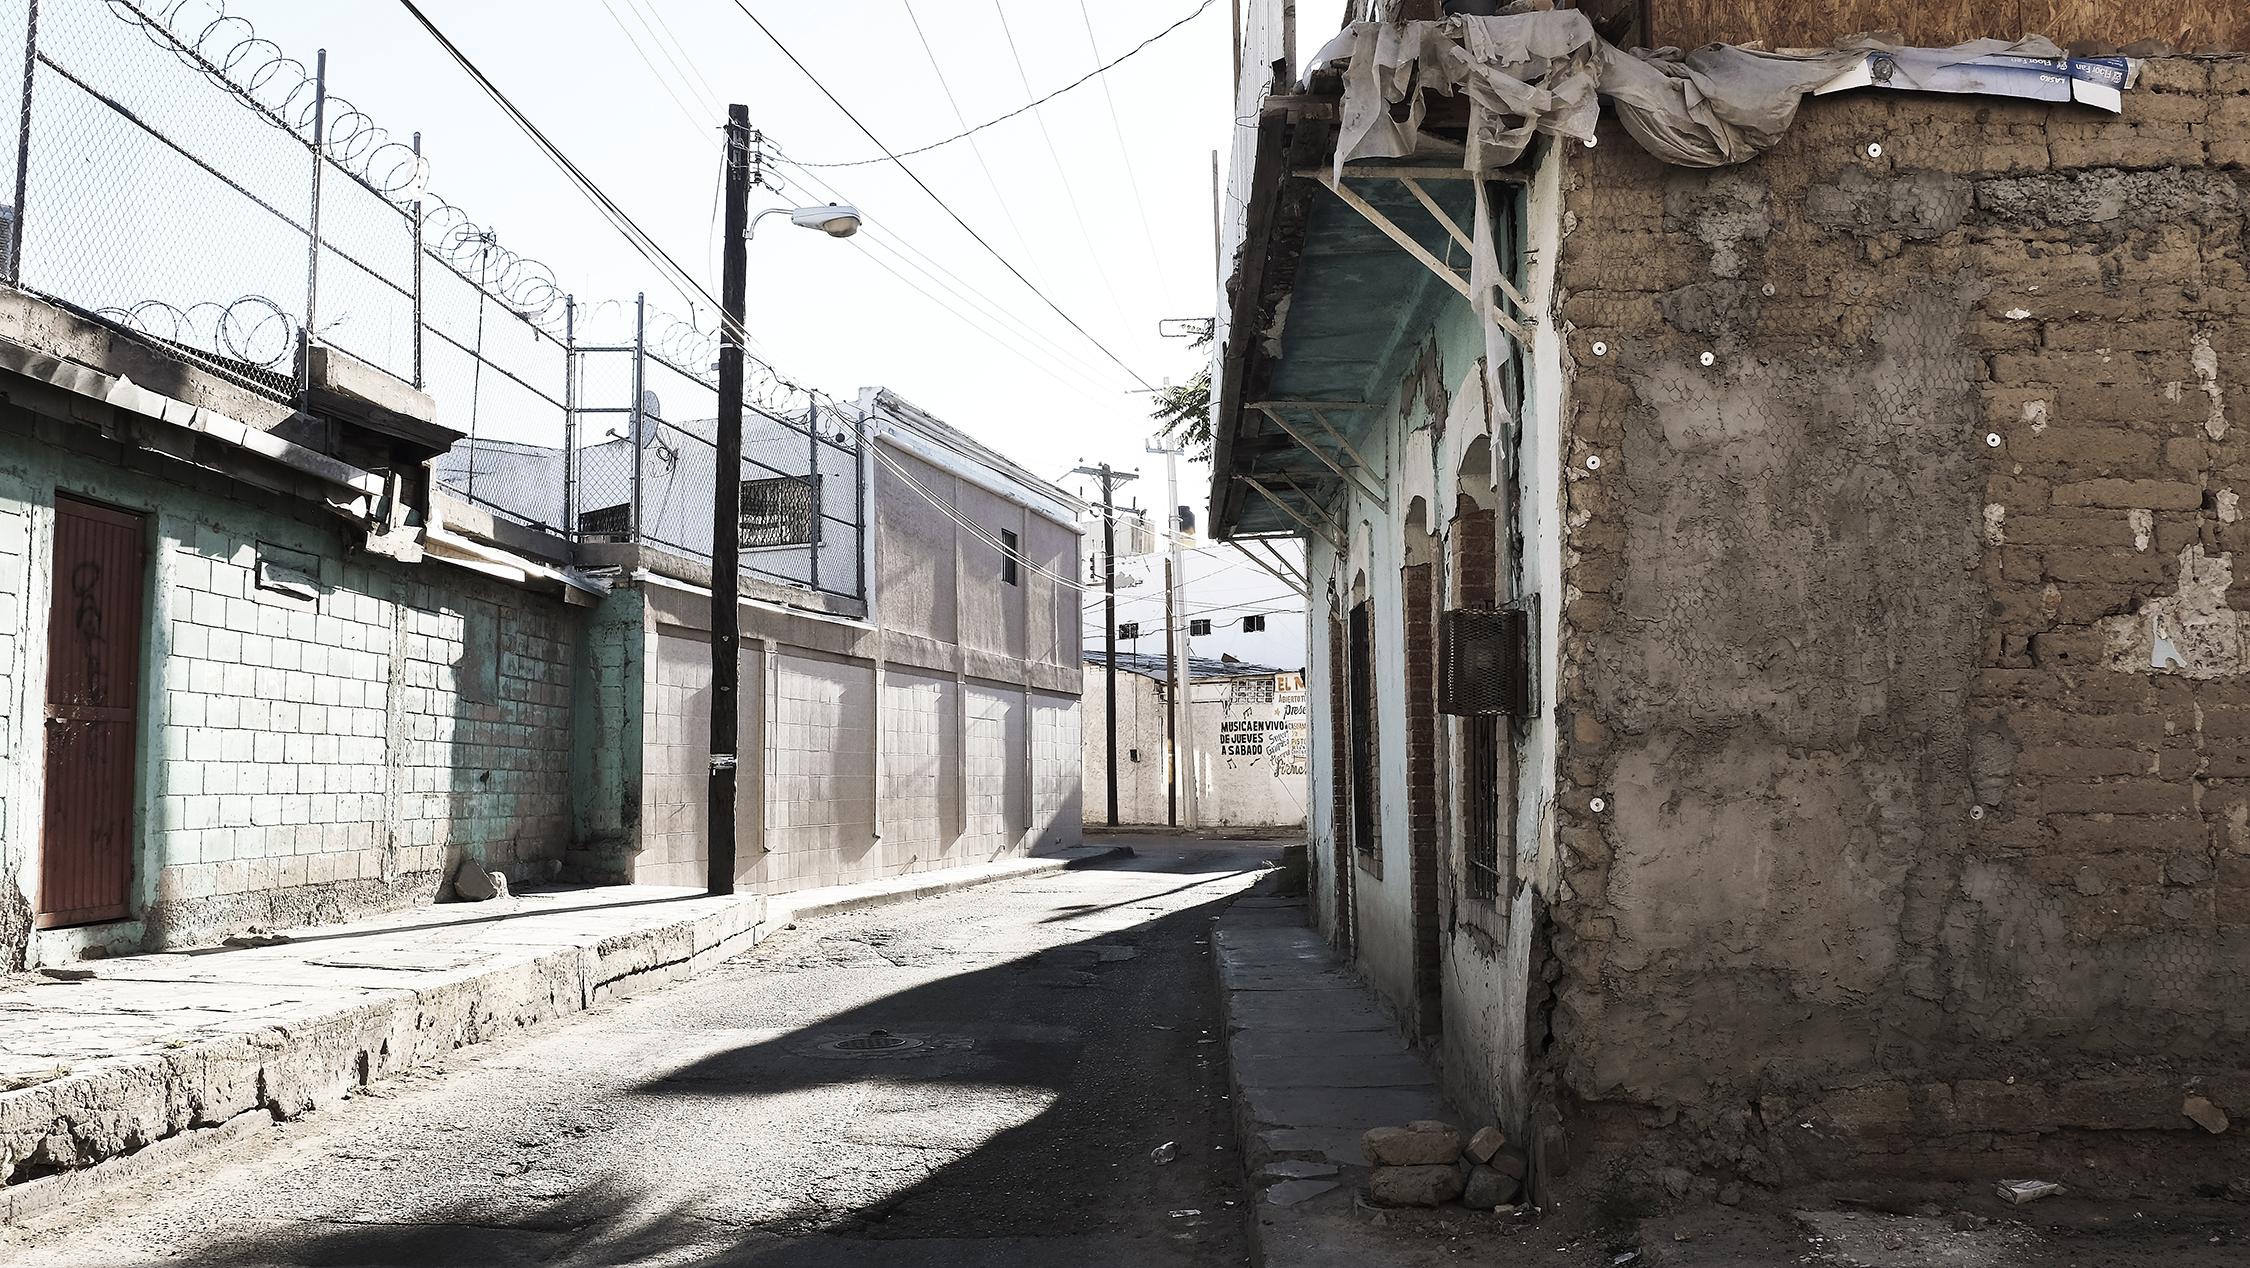 Juarez, Mexico.